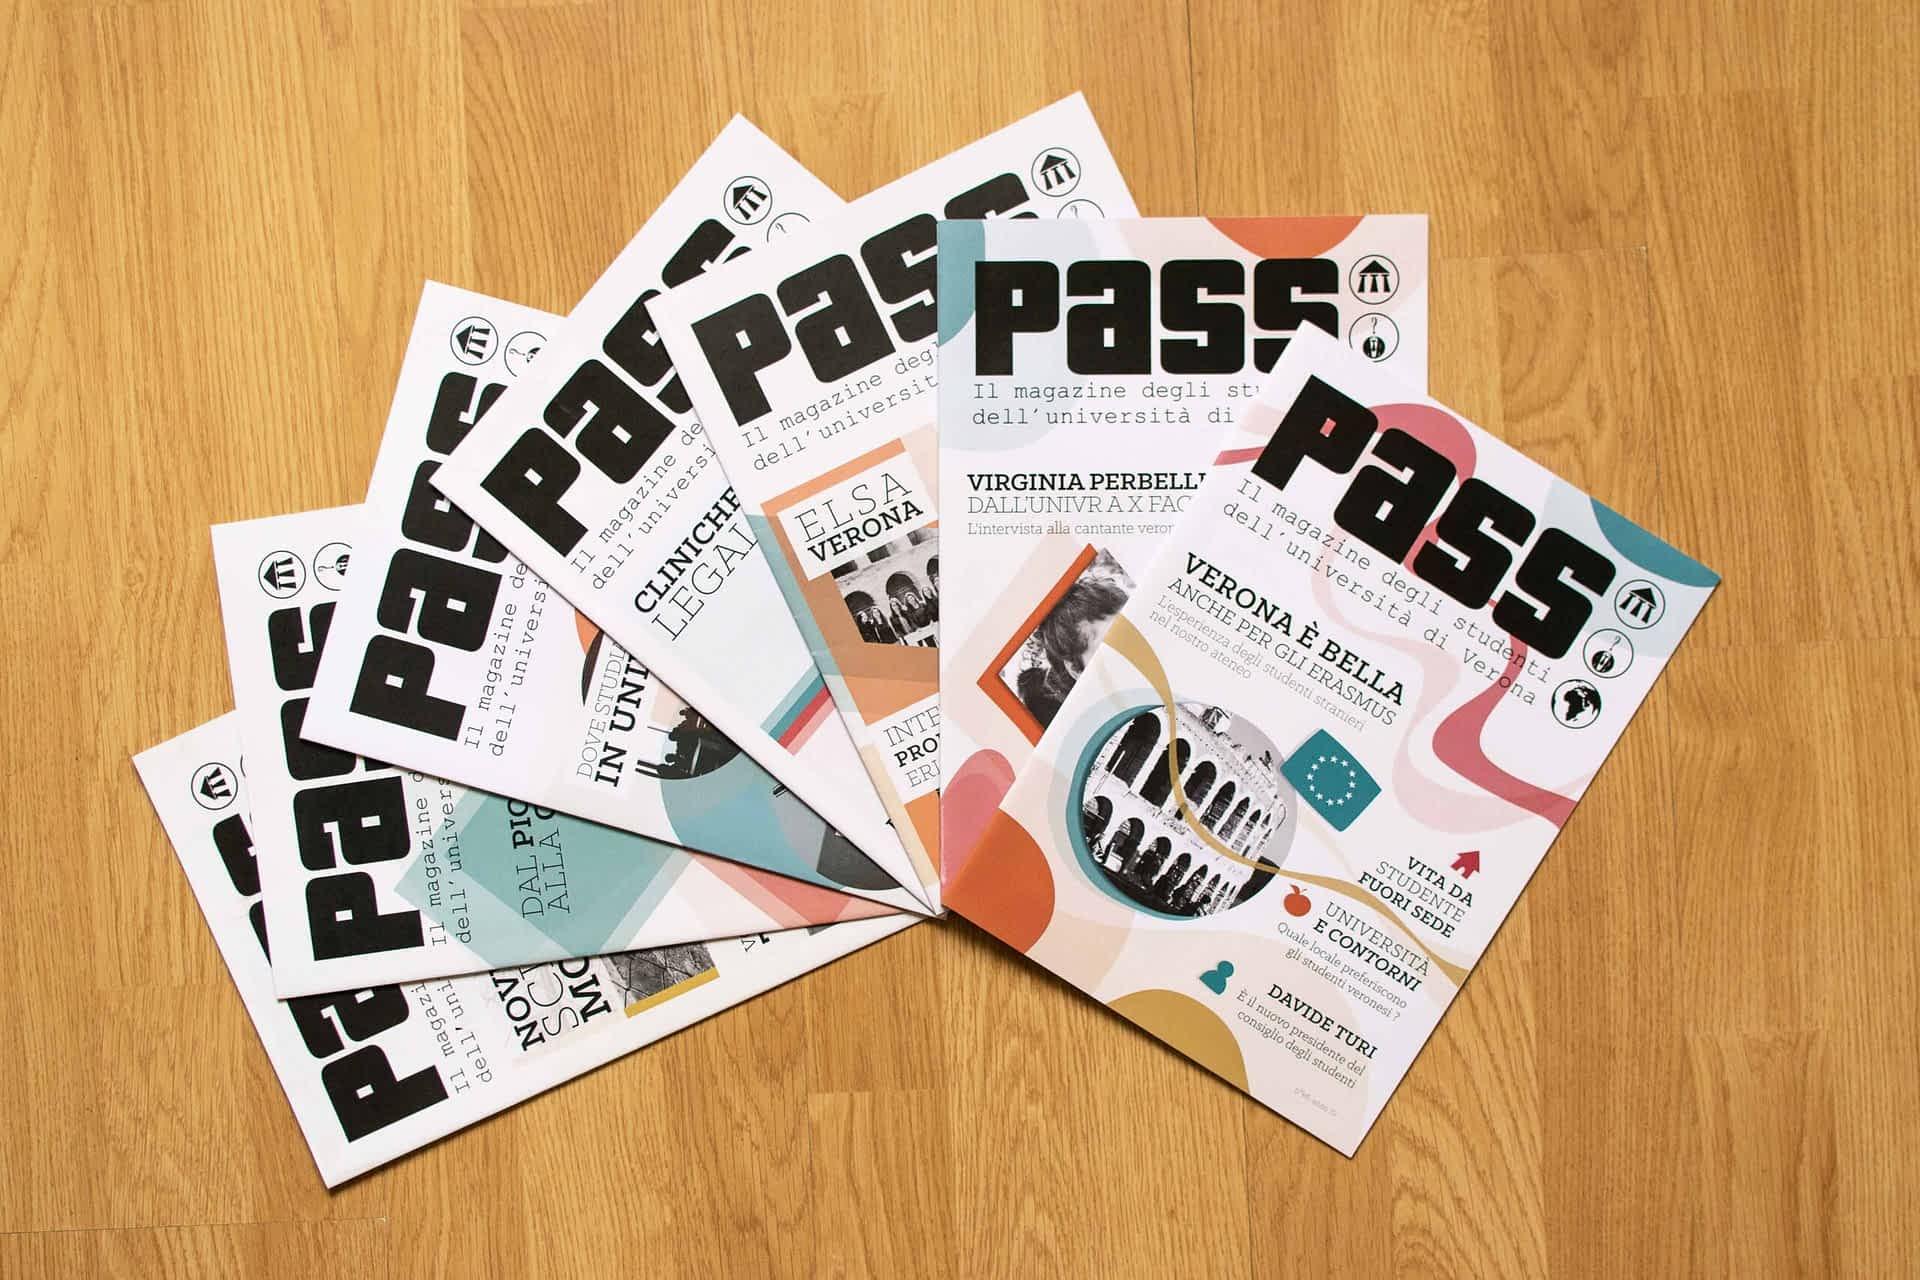 Alice_Stivala_Pass_Magazine-full